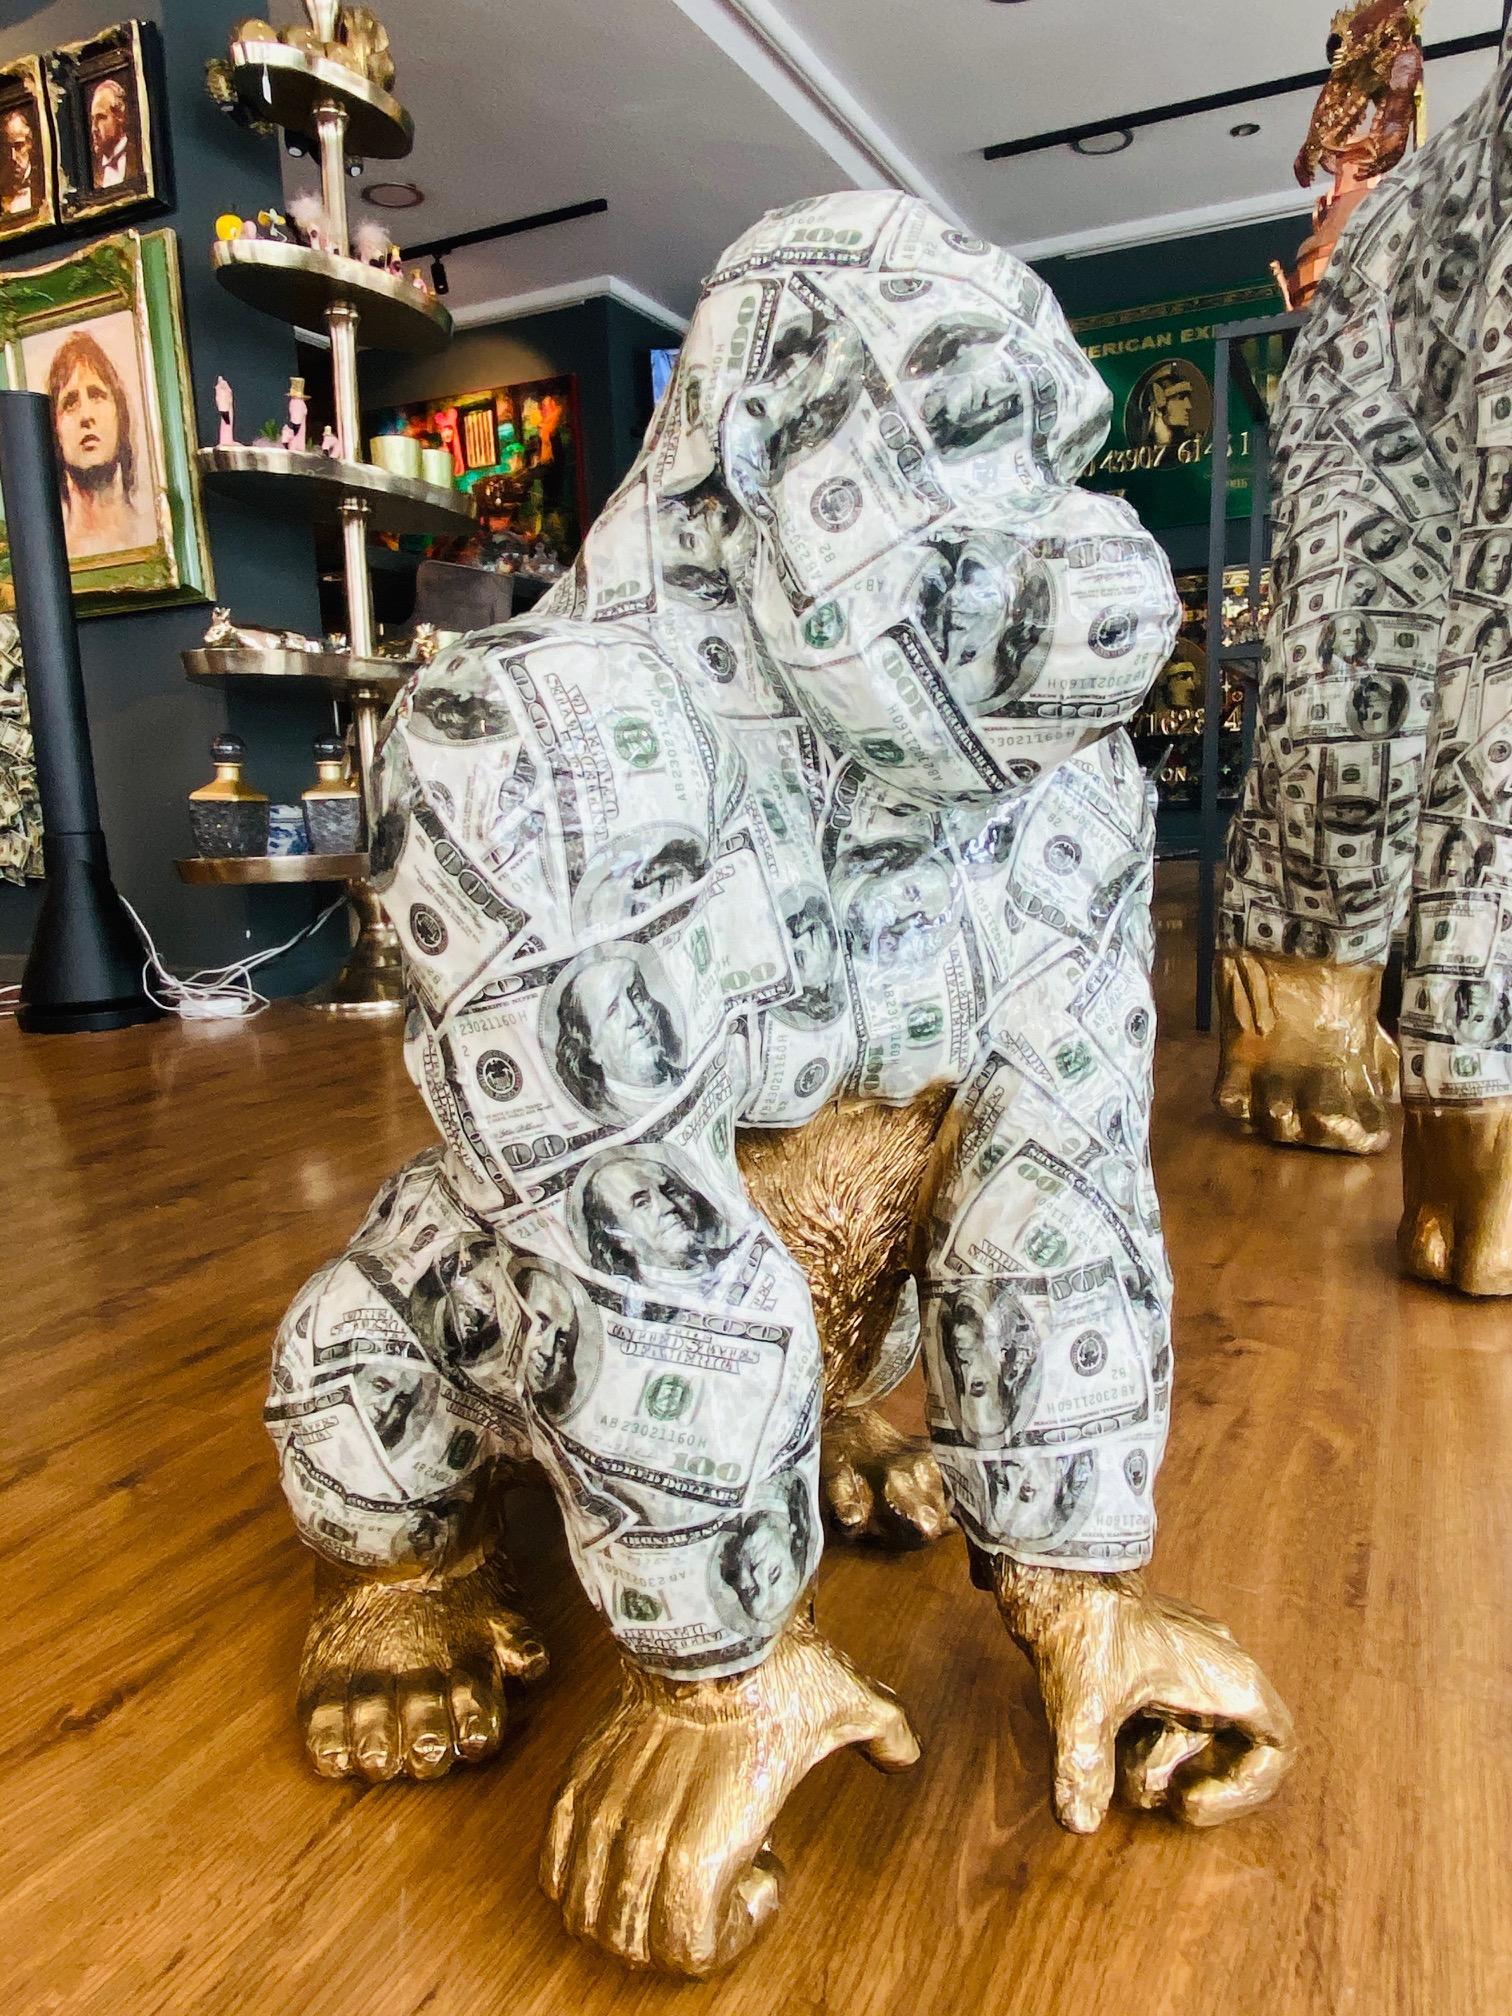 Ghost art Dollar baby gorilla